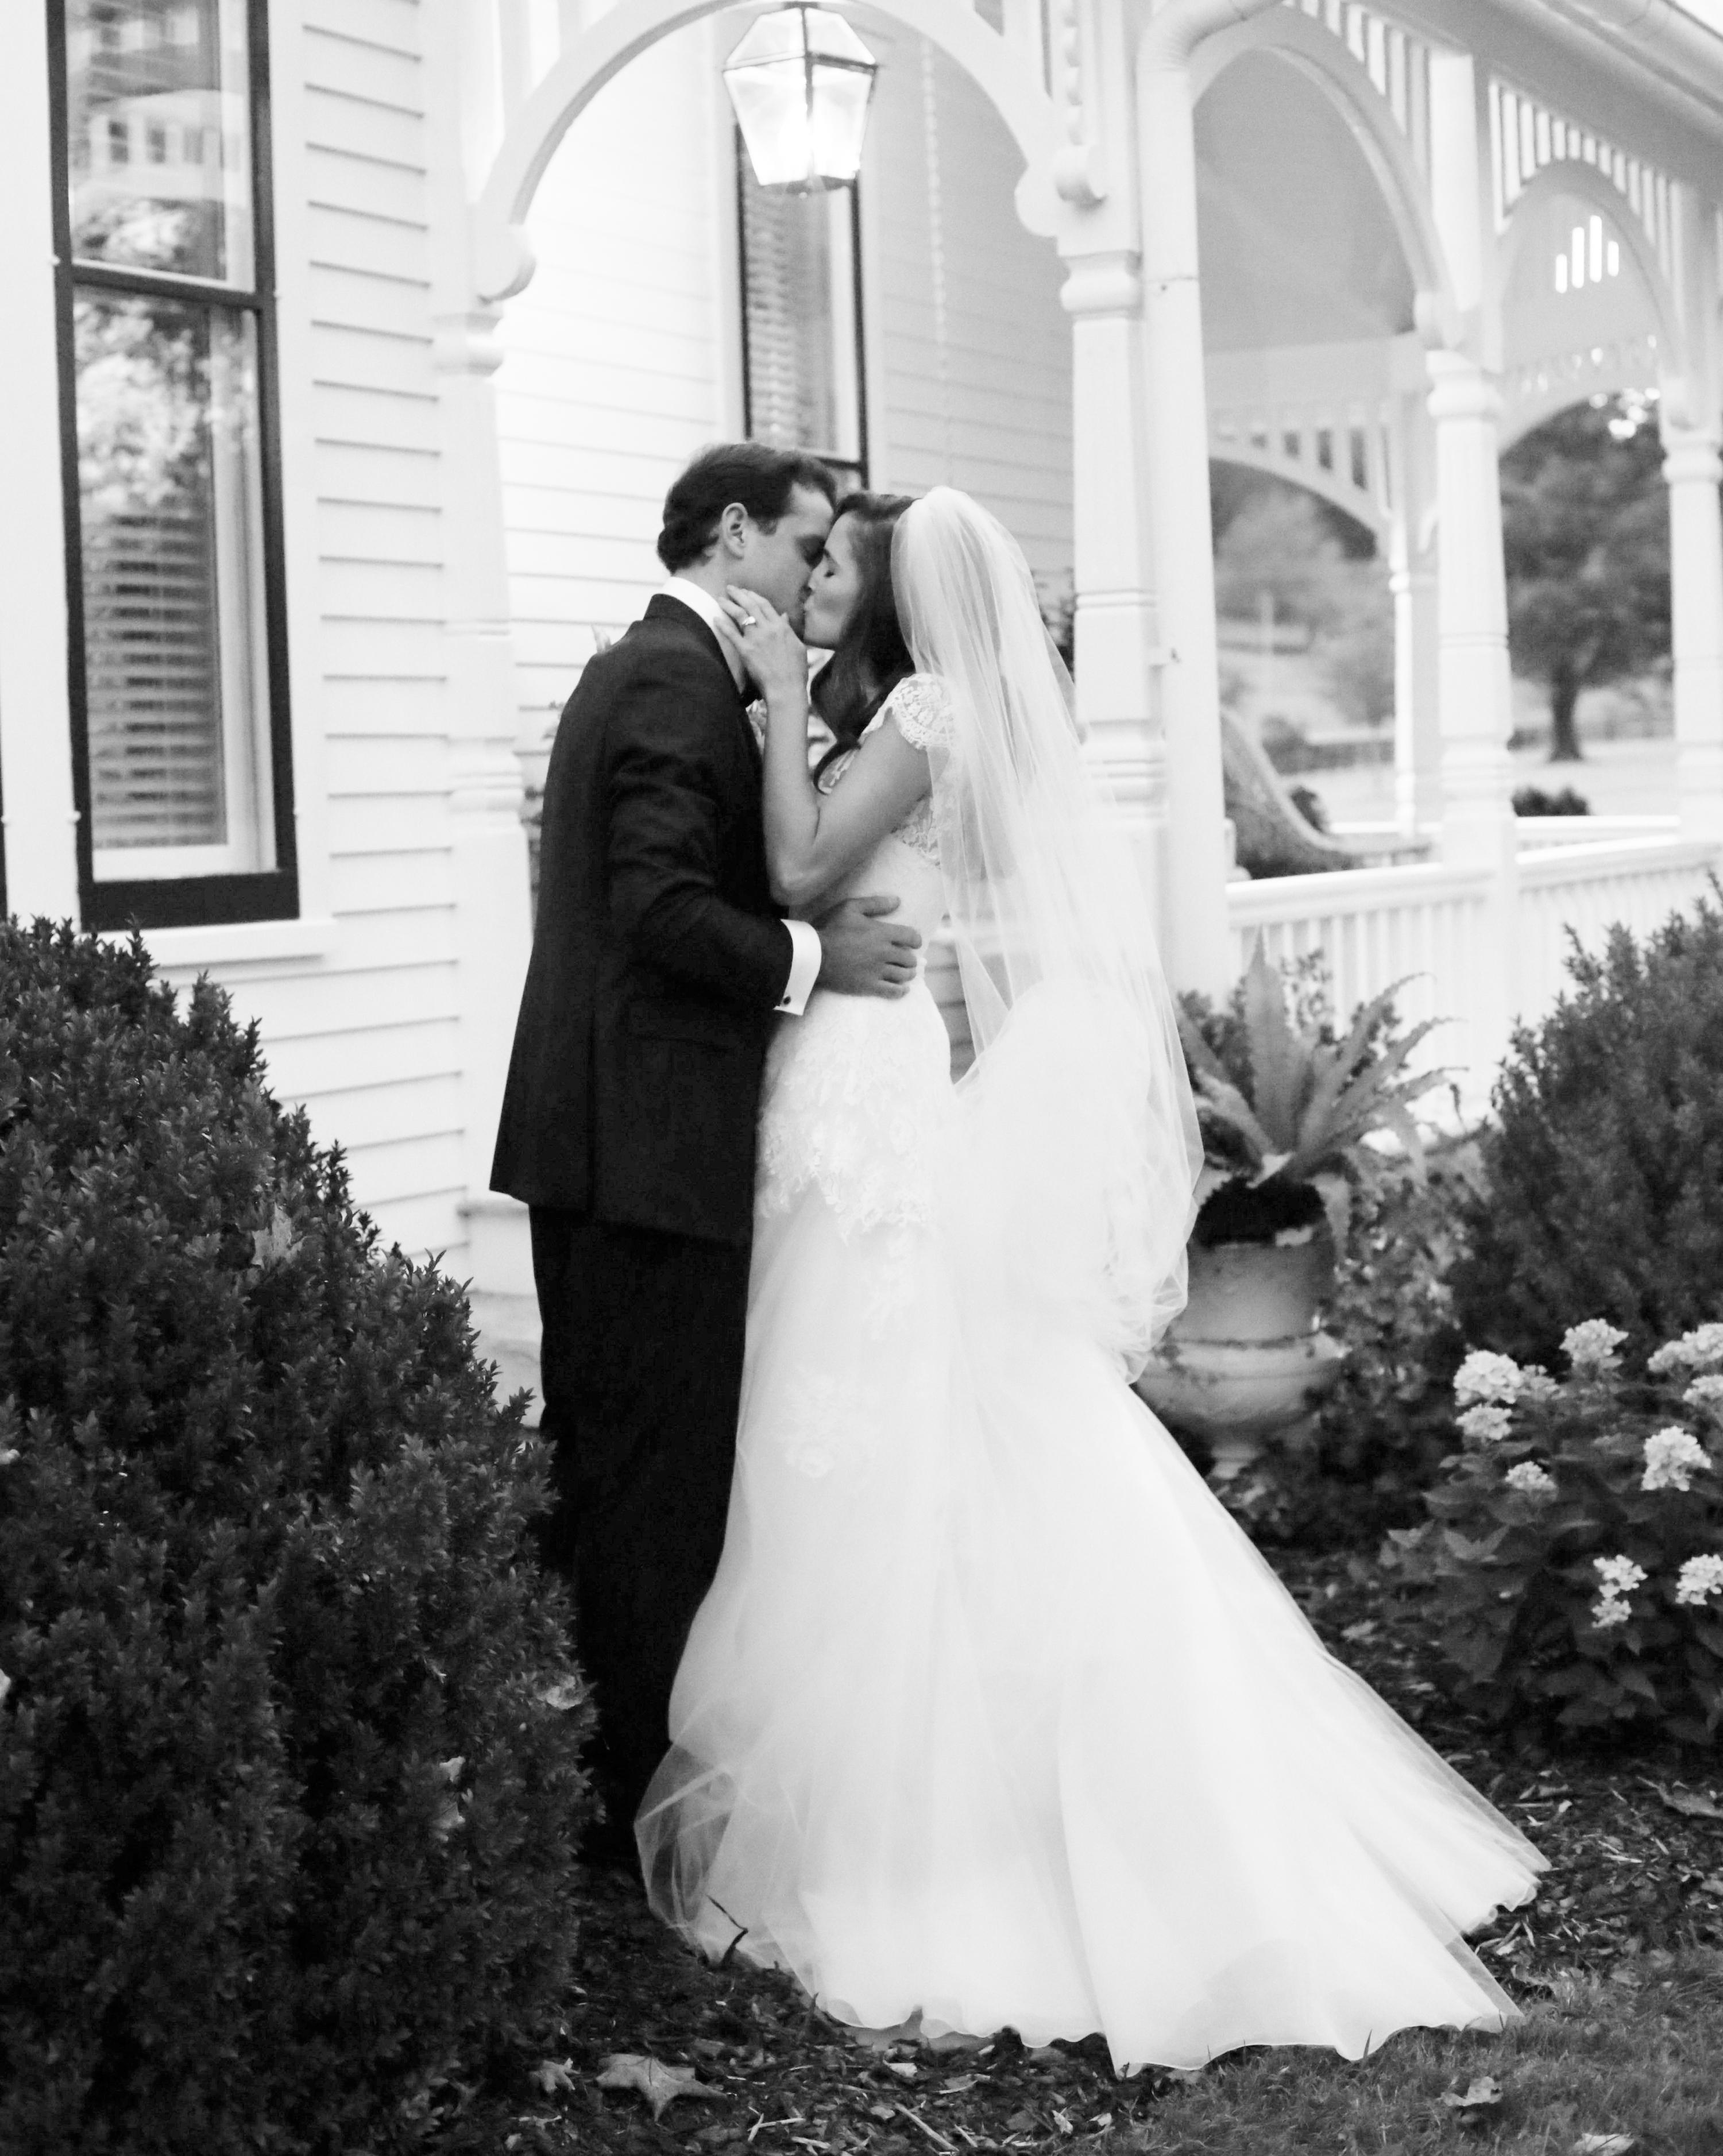 destiny-taylor-wedding-couple-440-s112347-1115.jpg